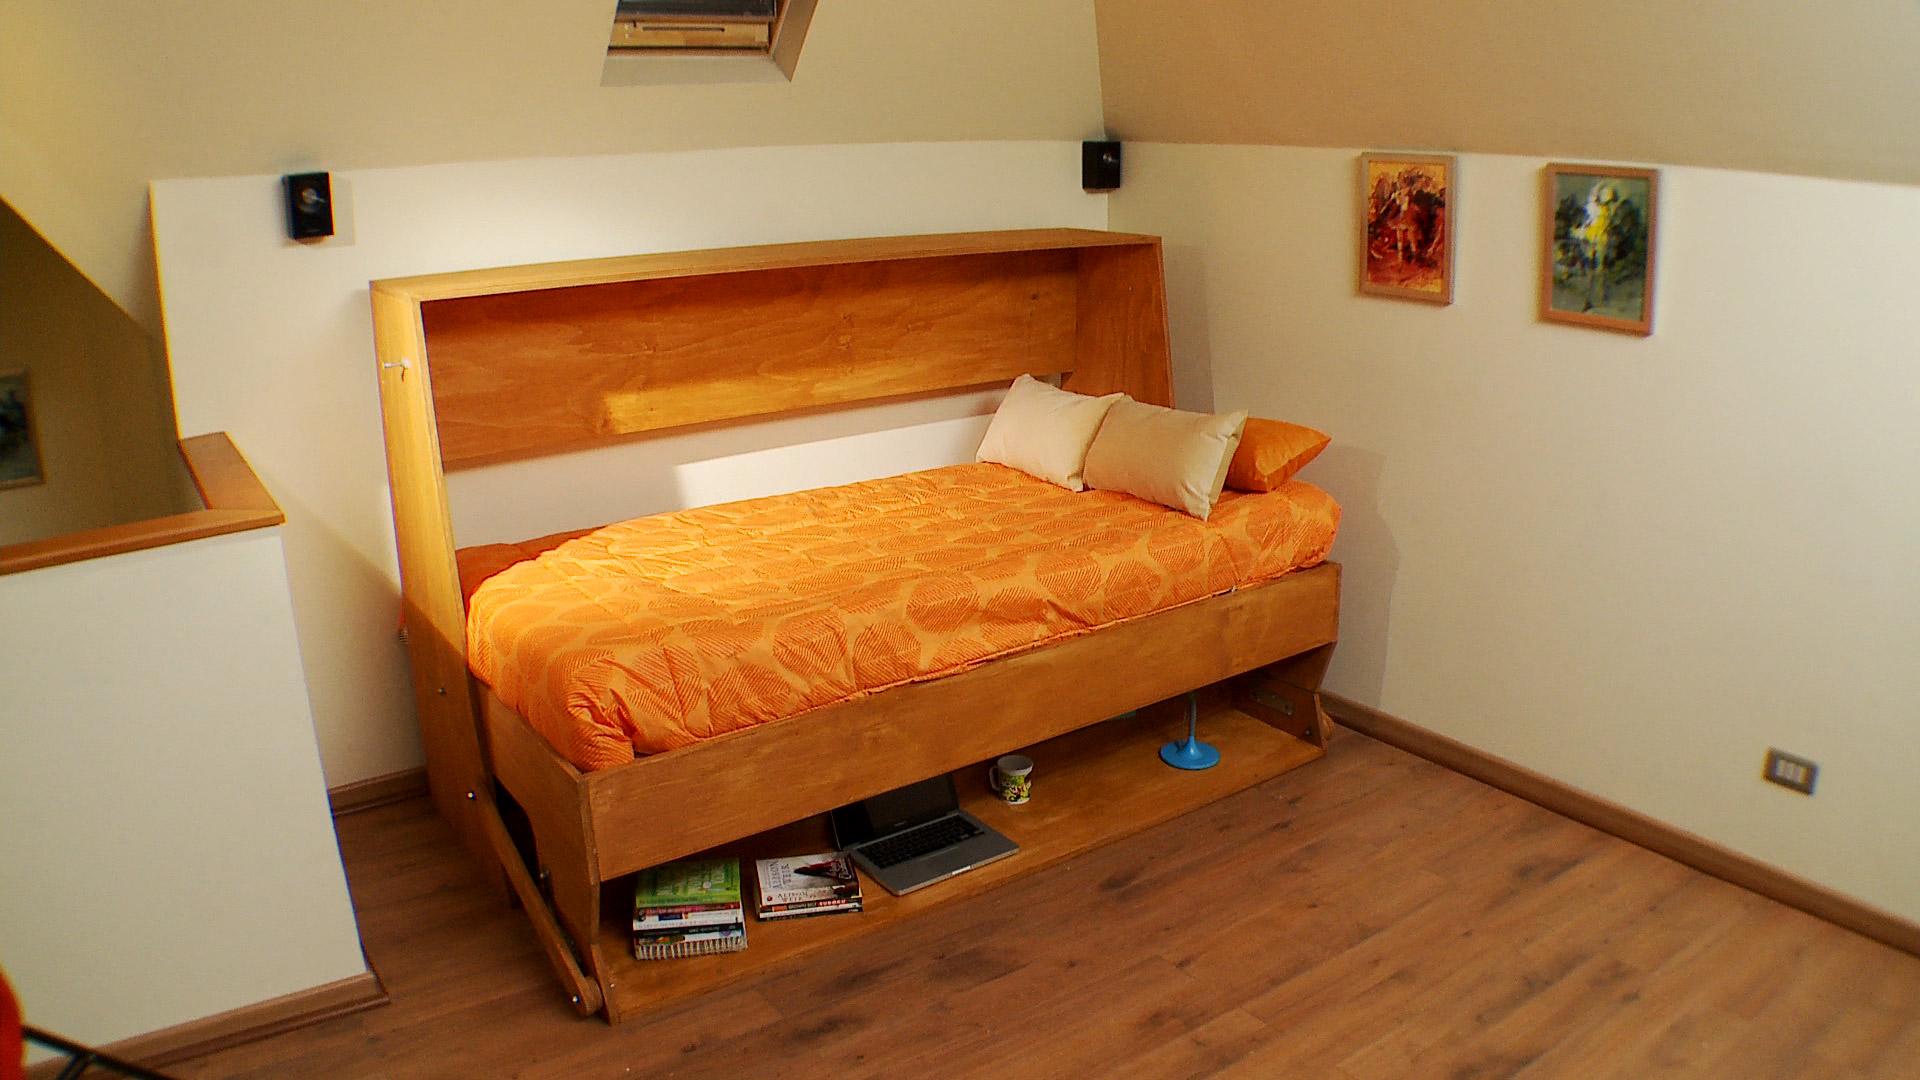 H galo usted mismo c mo construir un escritorio con cama plegable - Cama abatible matrimonio conforama ...